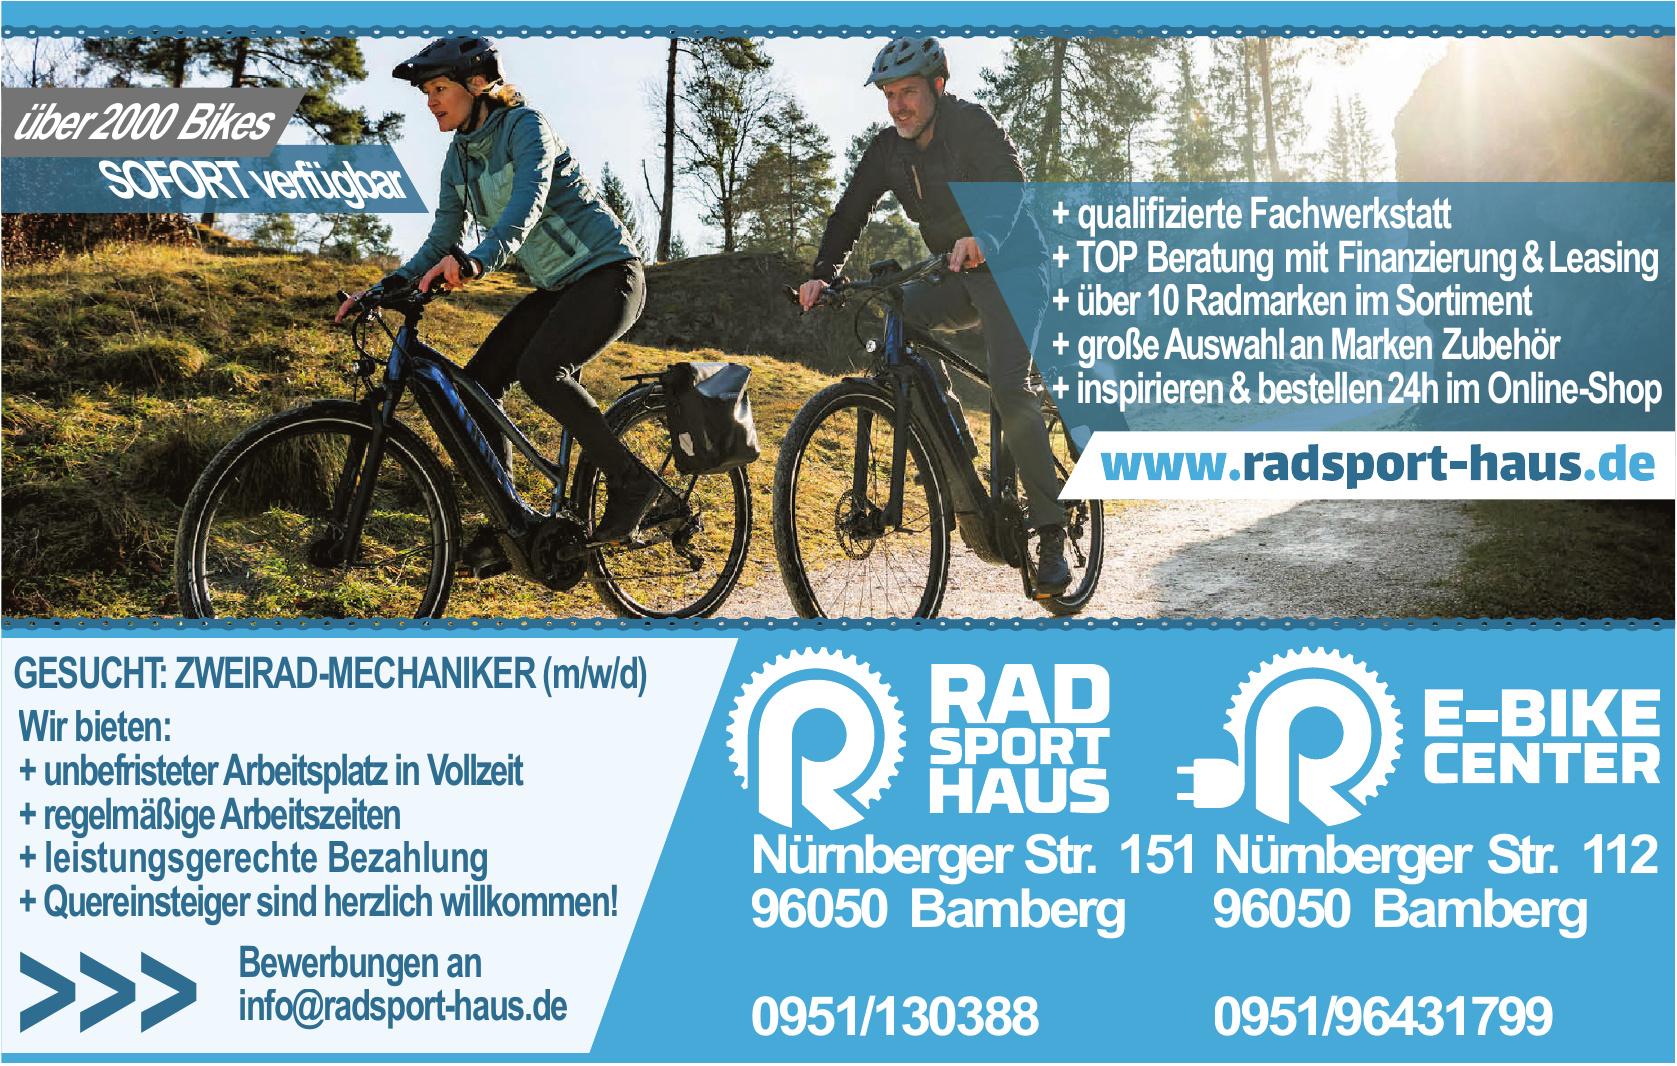 Radsport-Haus